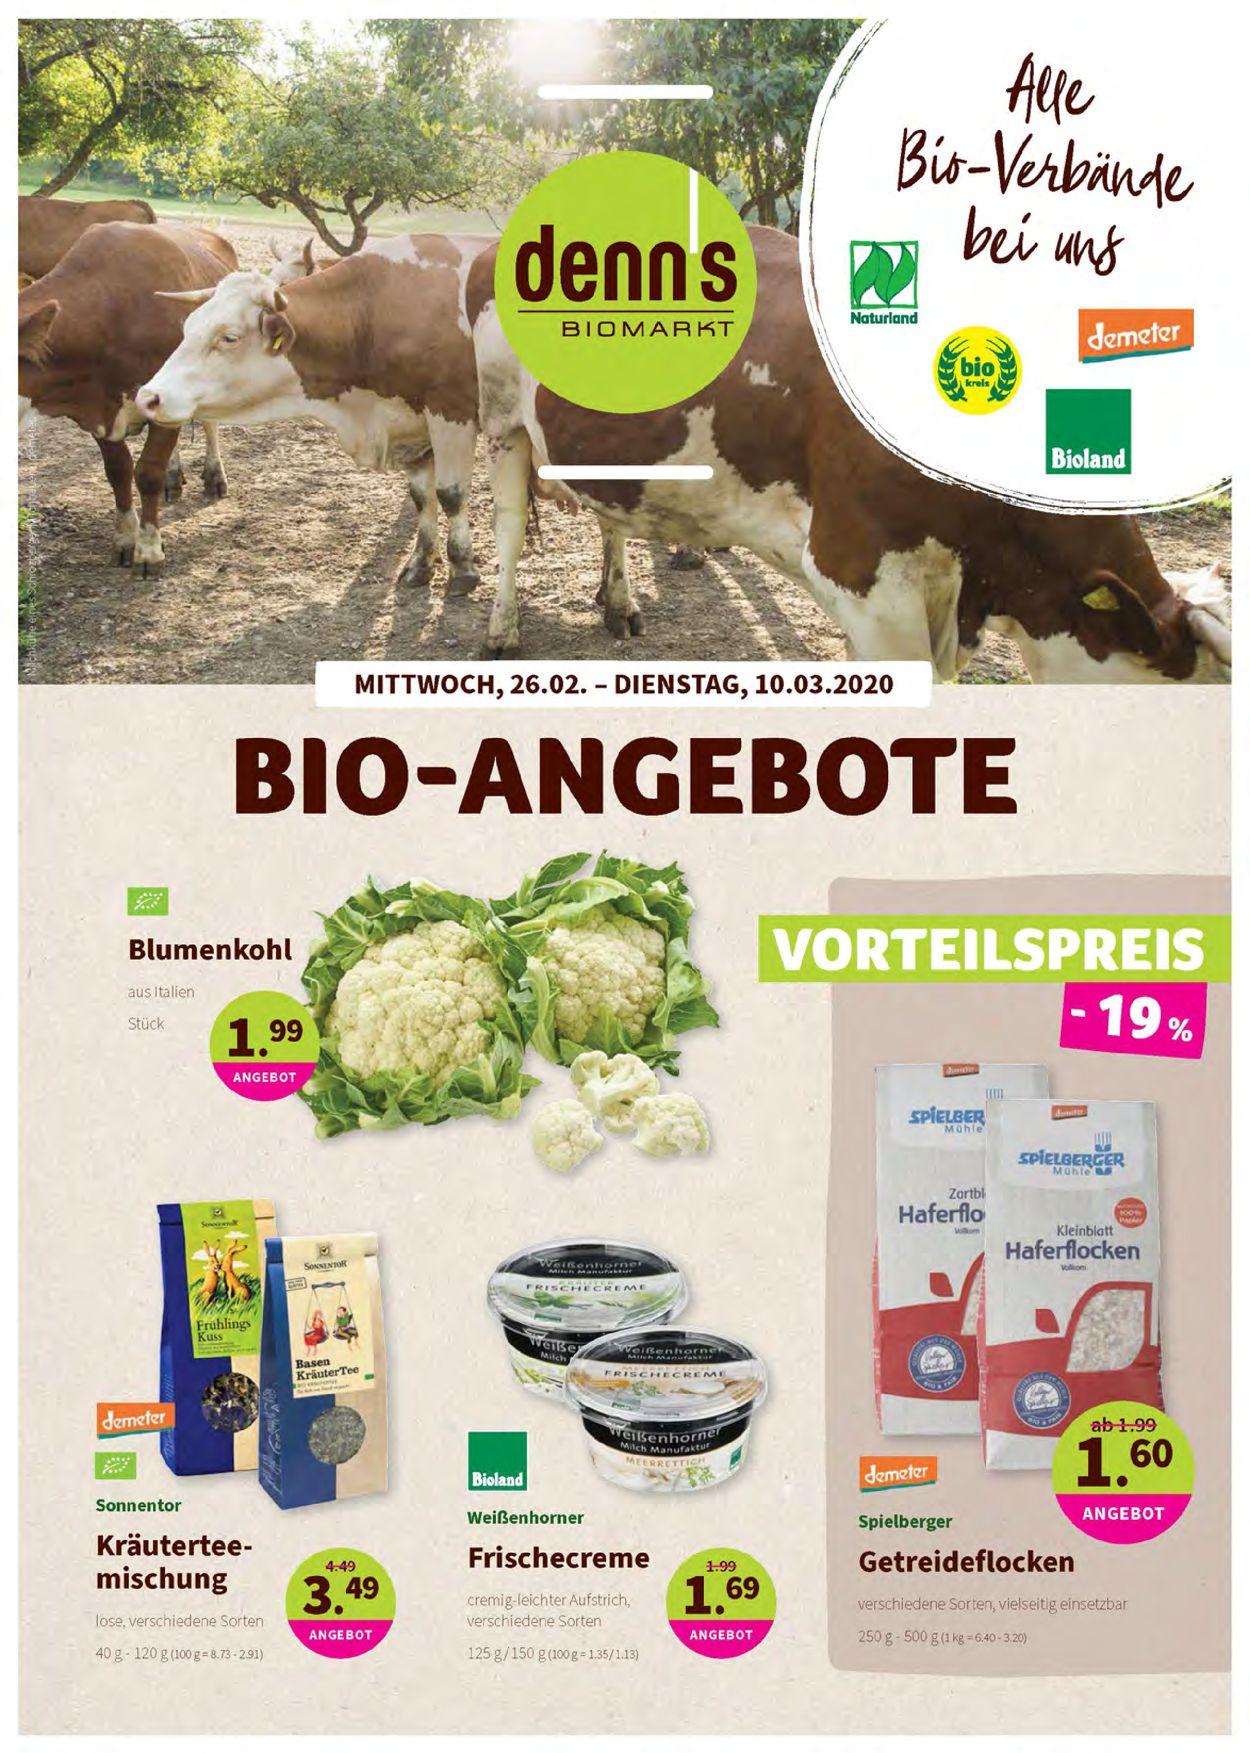 Prospekt Denn's Biomarkt vom 26.02.2020